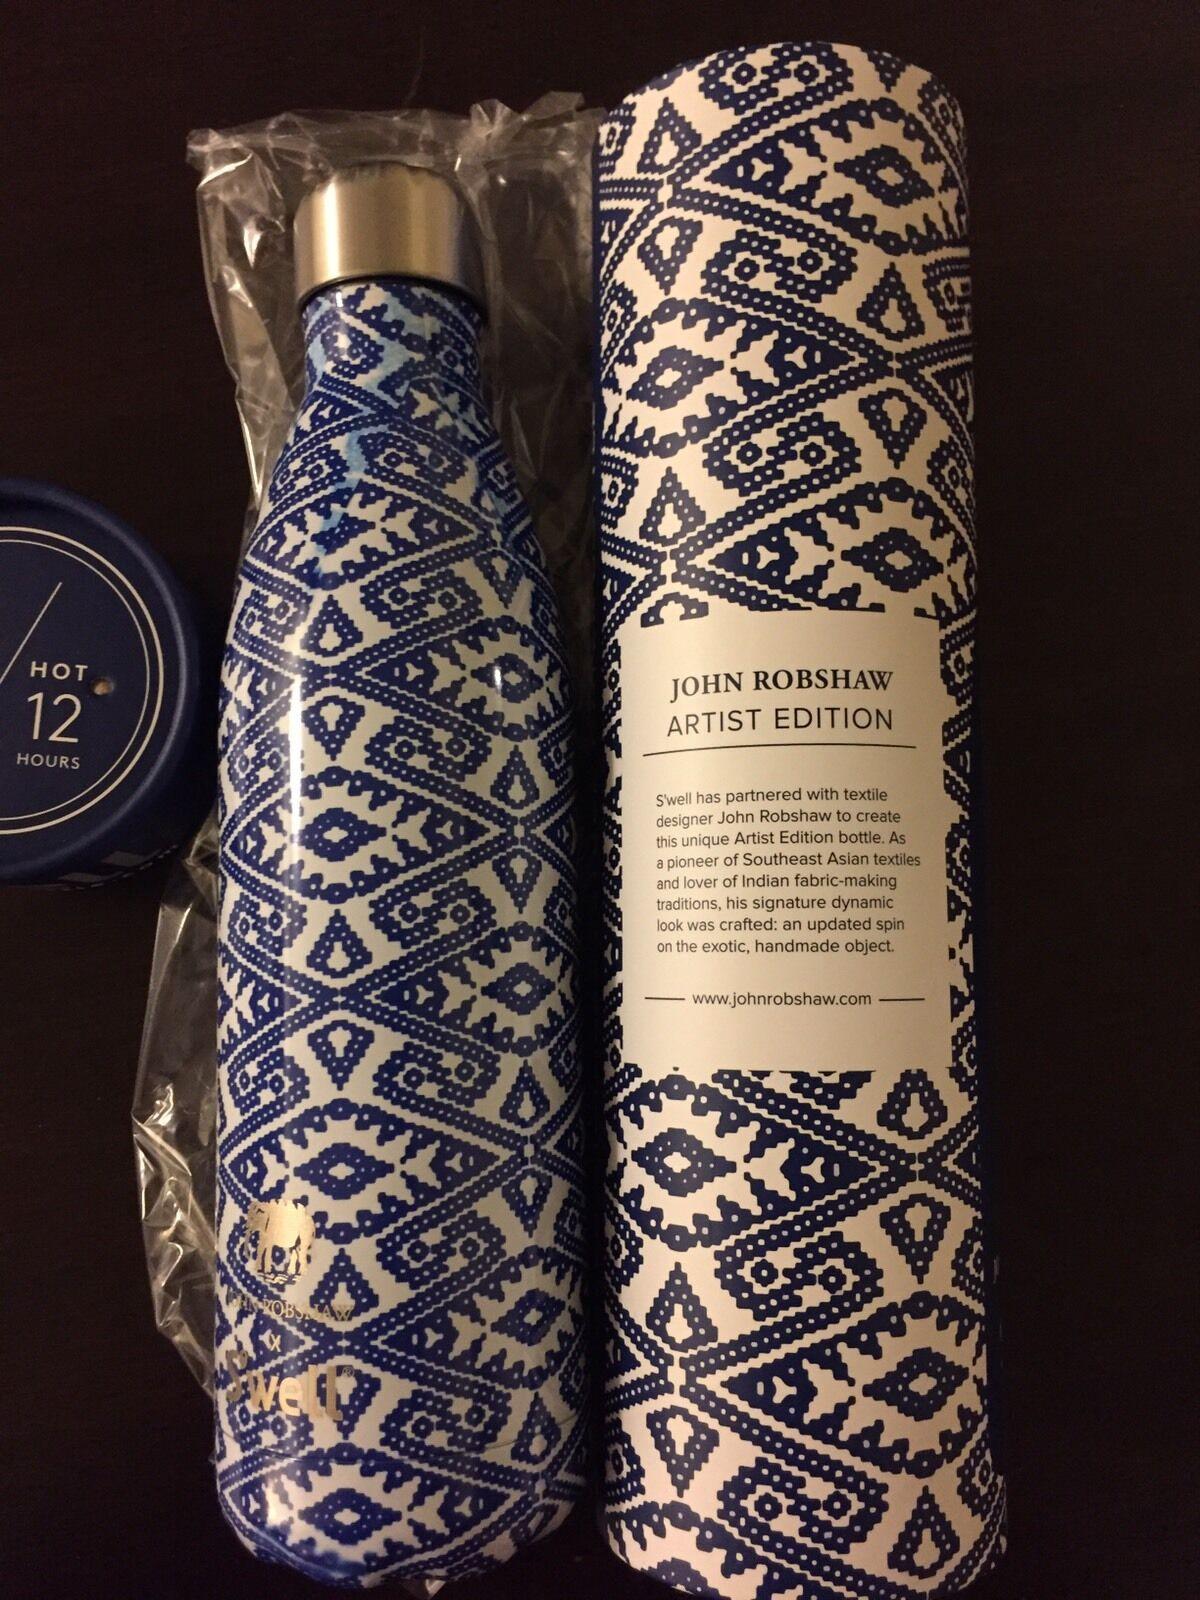 S'well Bottle by John Robshaw 25 oz bluee Vati Limited Edition NIB